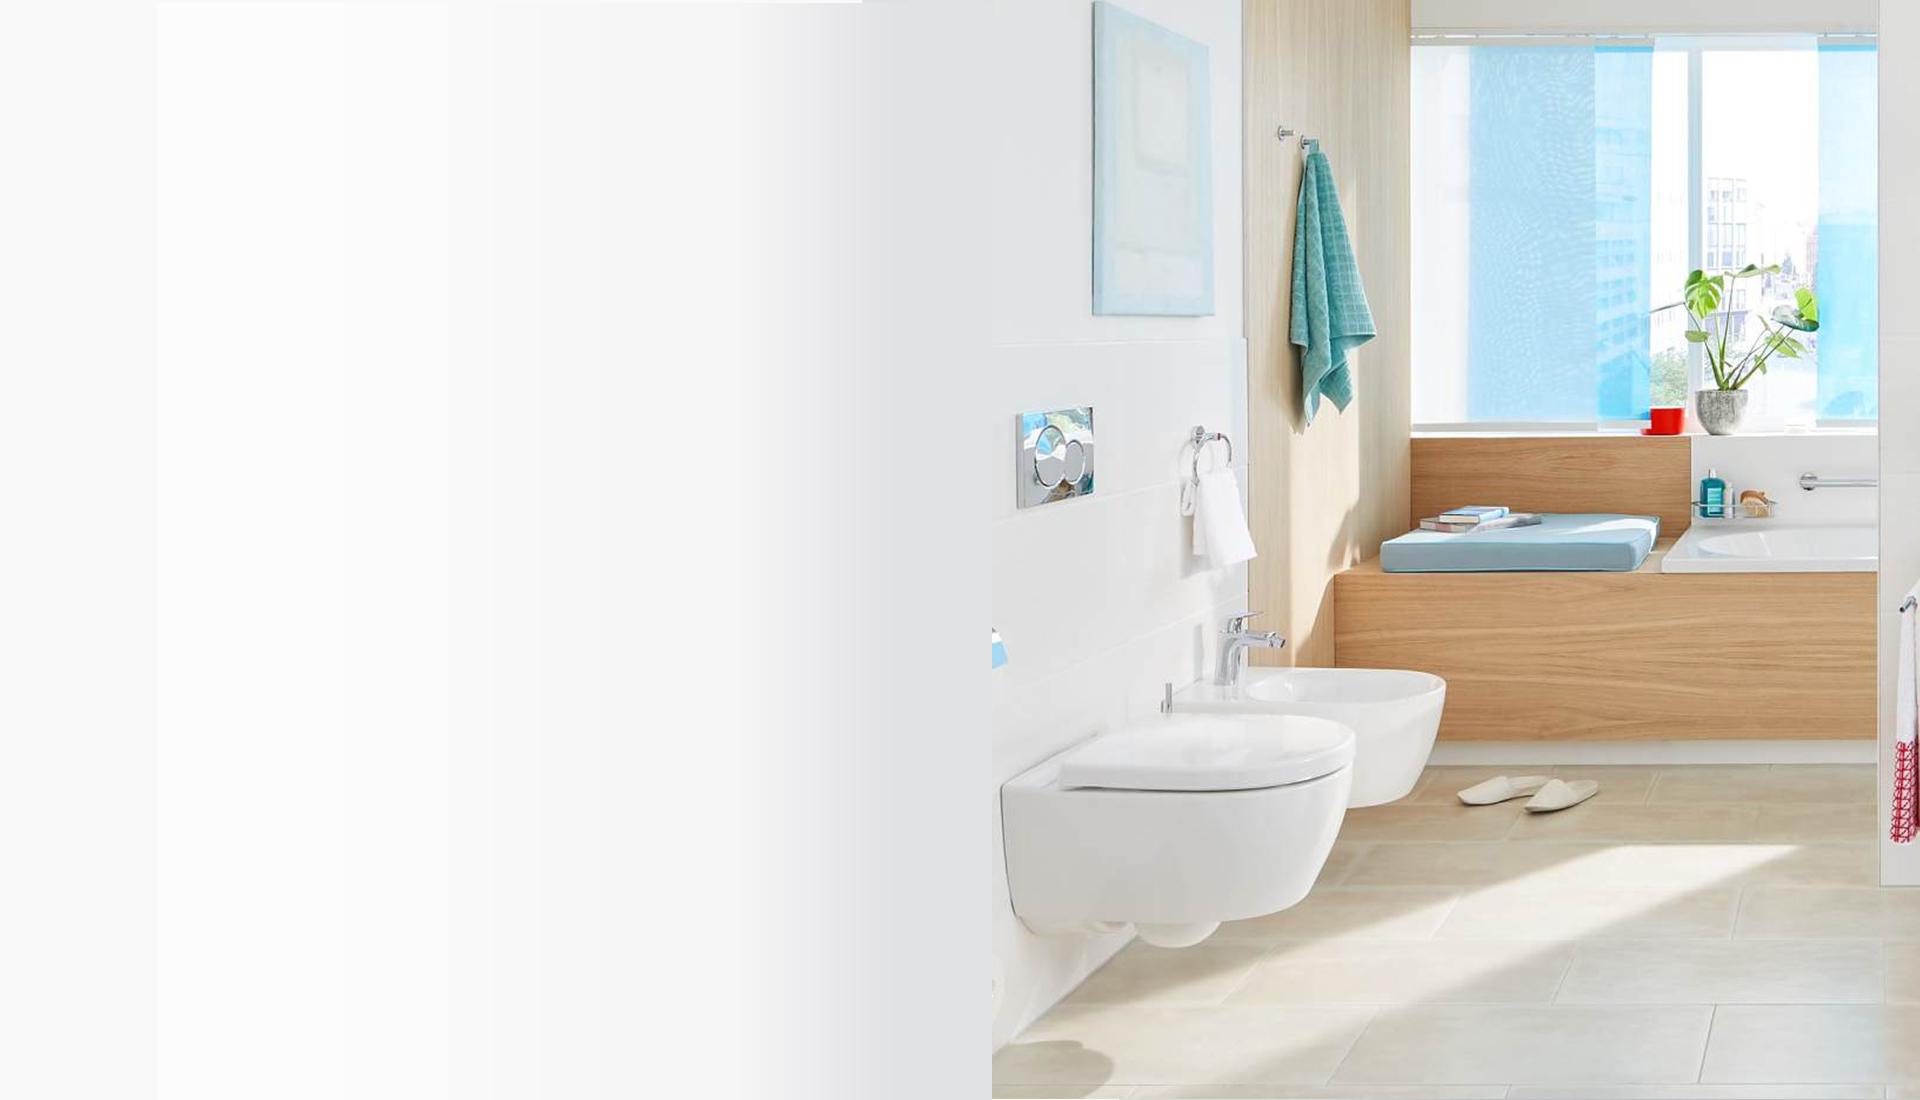 http://certifiedgasheating.co.uk/wp-content/uploads/2020/01/background_faucet_08.jpg